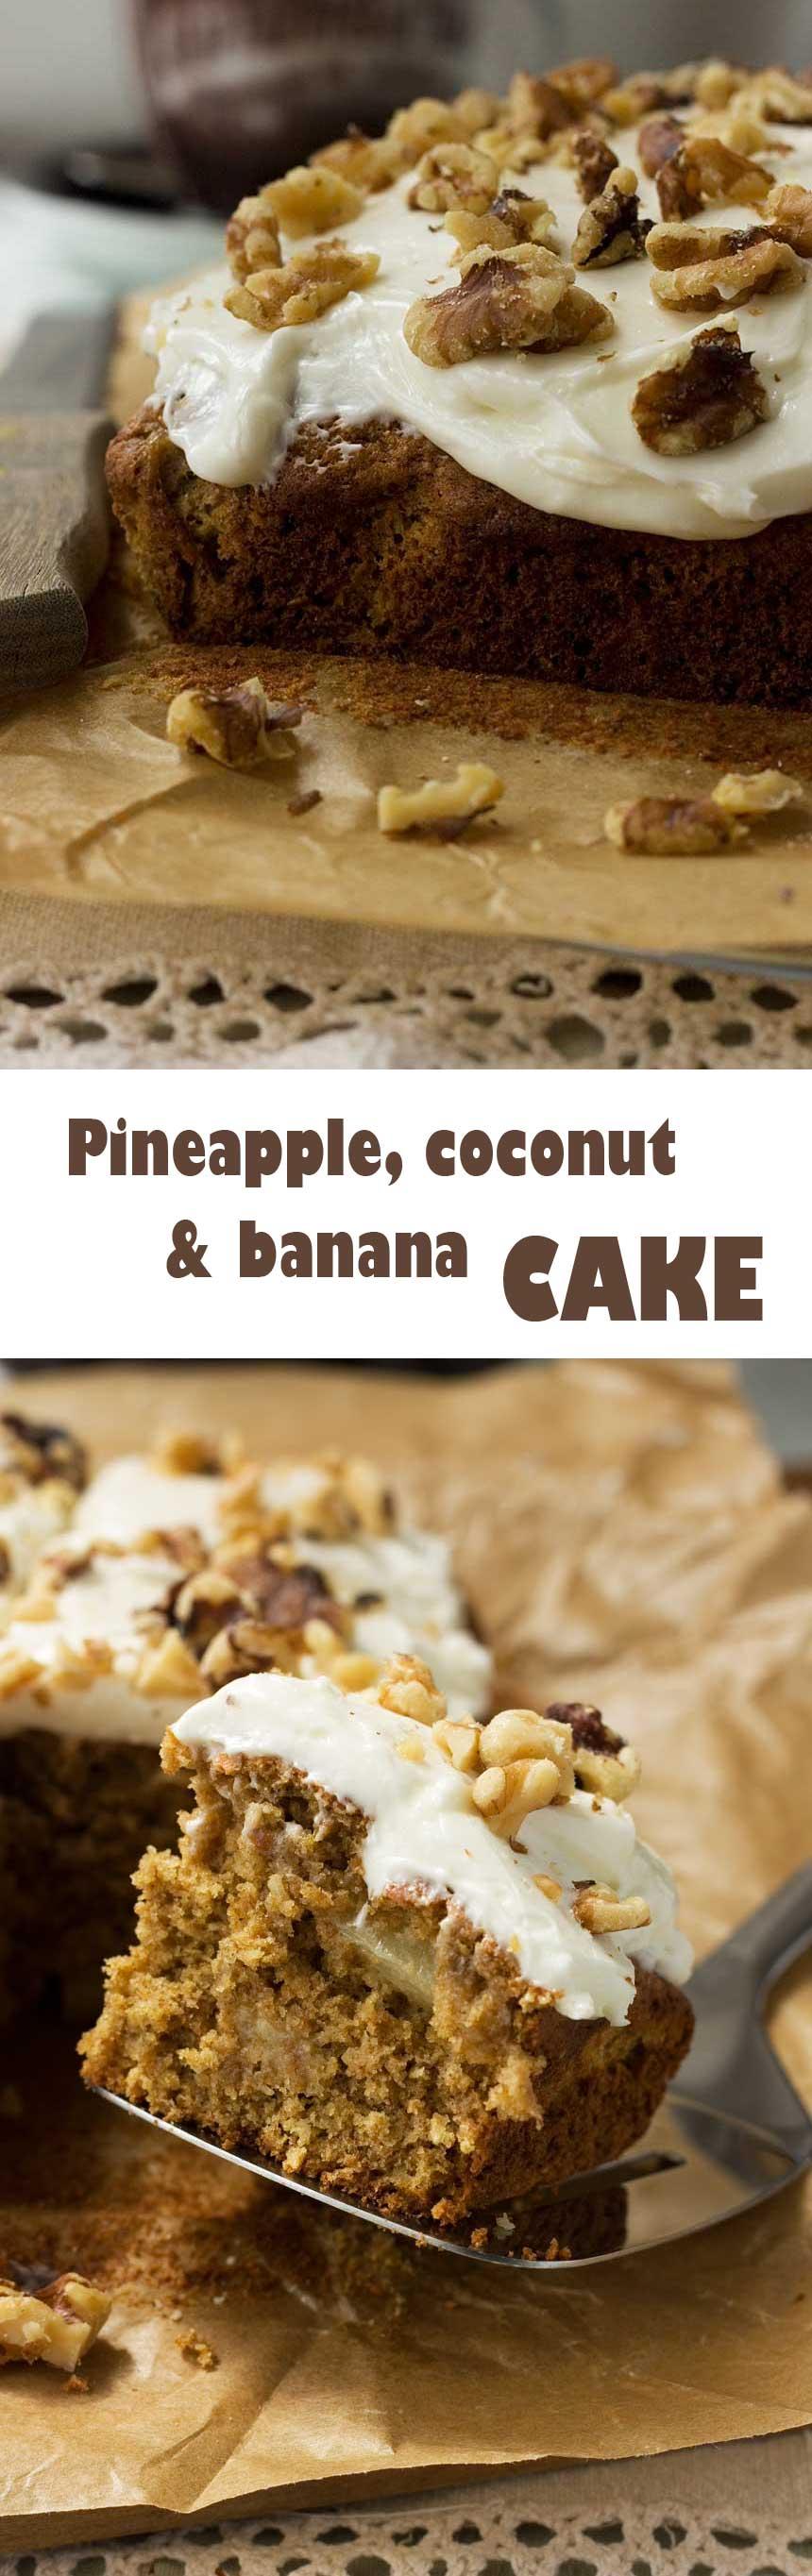 Pineapple, coconut and banana cake - like carrot cake with a tropical twist!